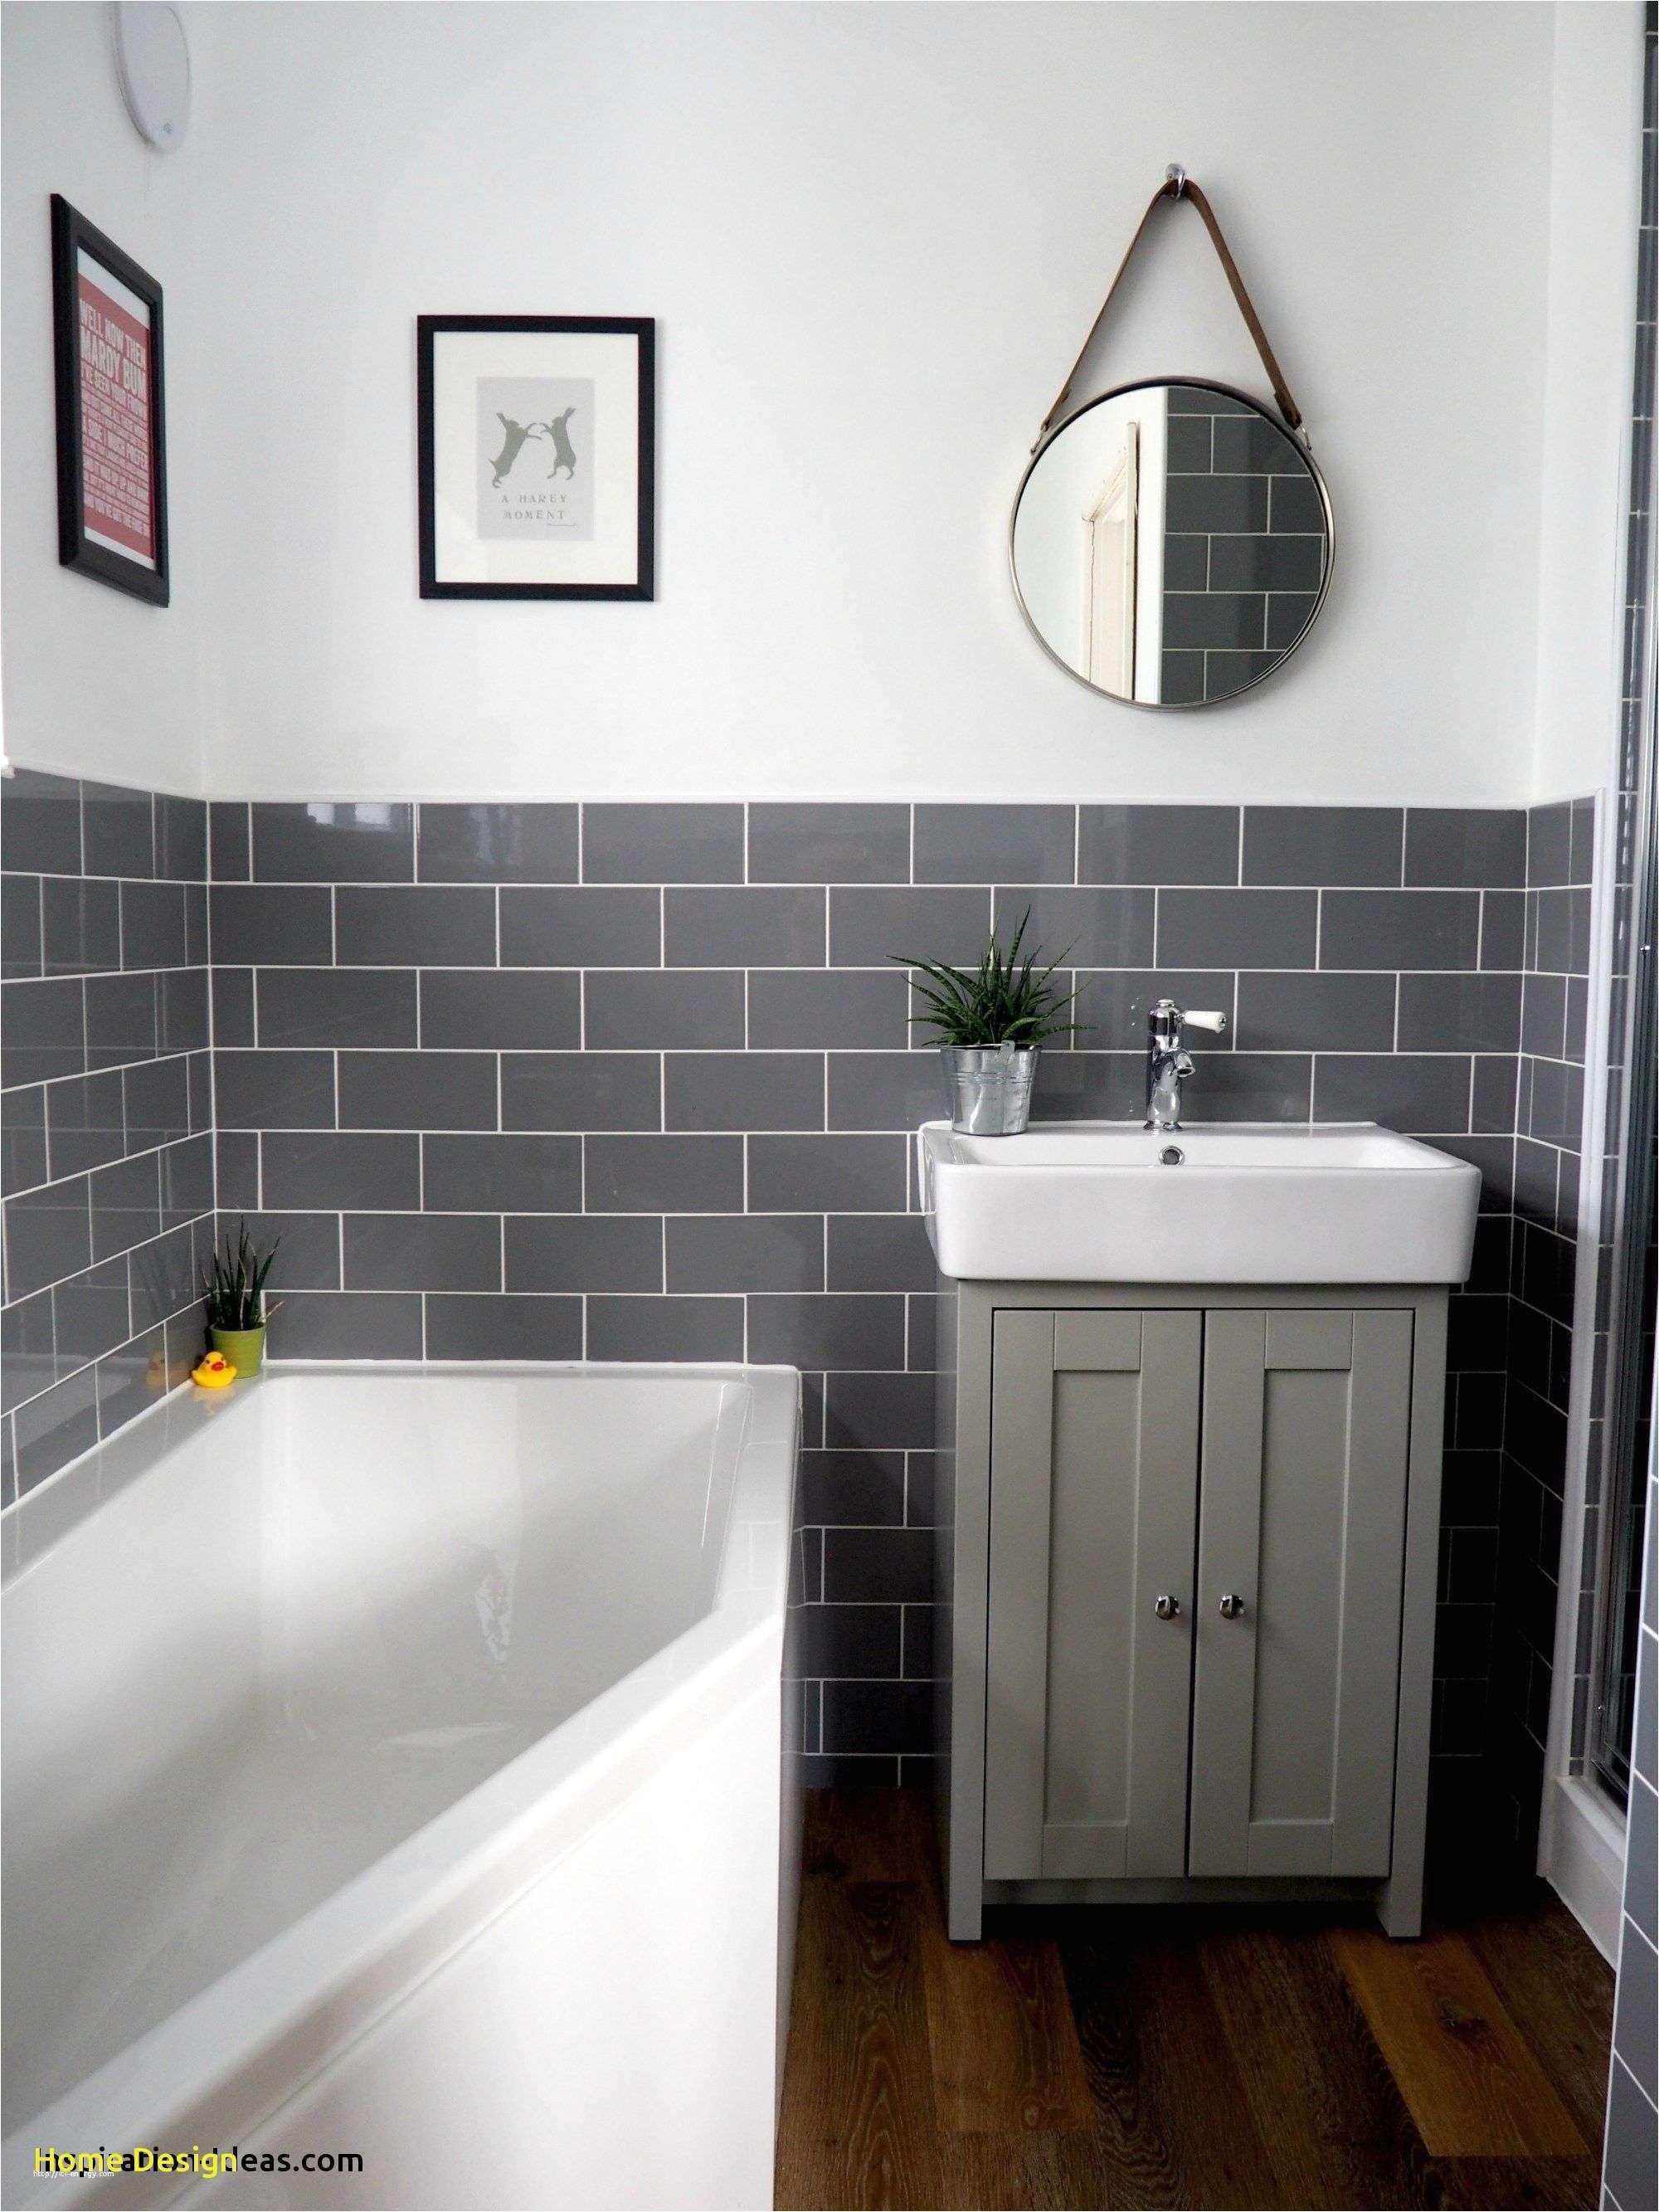 Bathroom Design Ideas Blog Bathroom Designs Fresh Bathroom Design Blogs Home Design